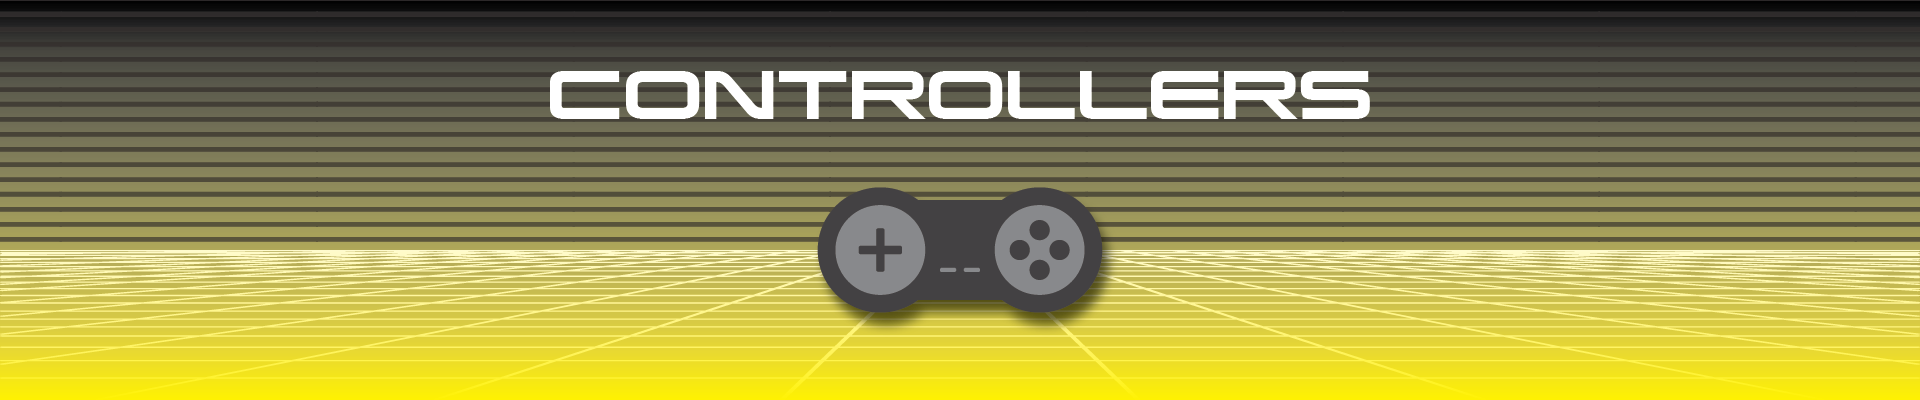 Controllers, dpad, analog, gamepads, pc, usb, nes, snes, genesis, sega, n64, switch